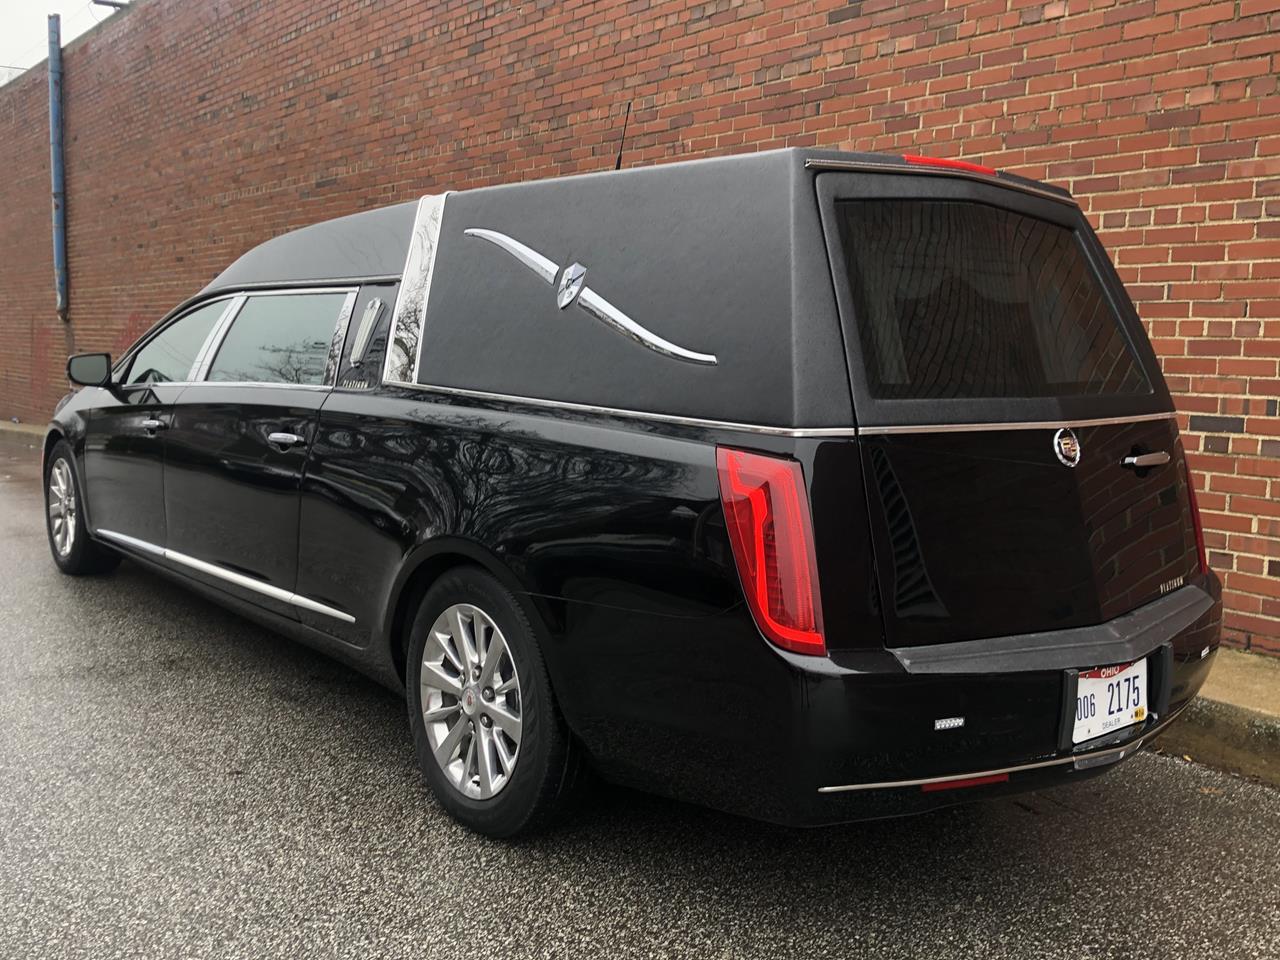 2014 Platinum Cadillac Phoenix Hearse For Sale Near Me